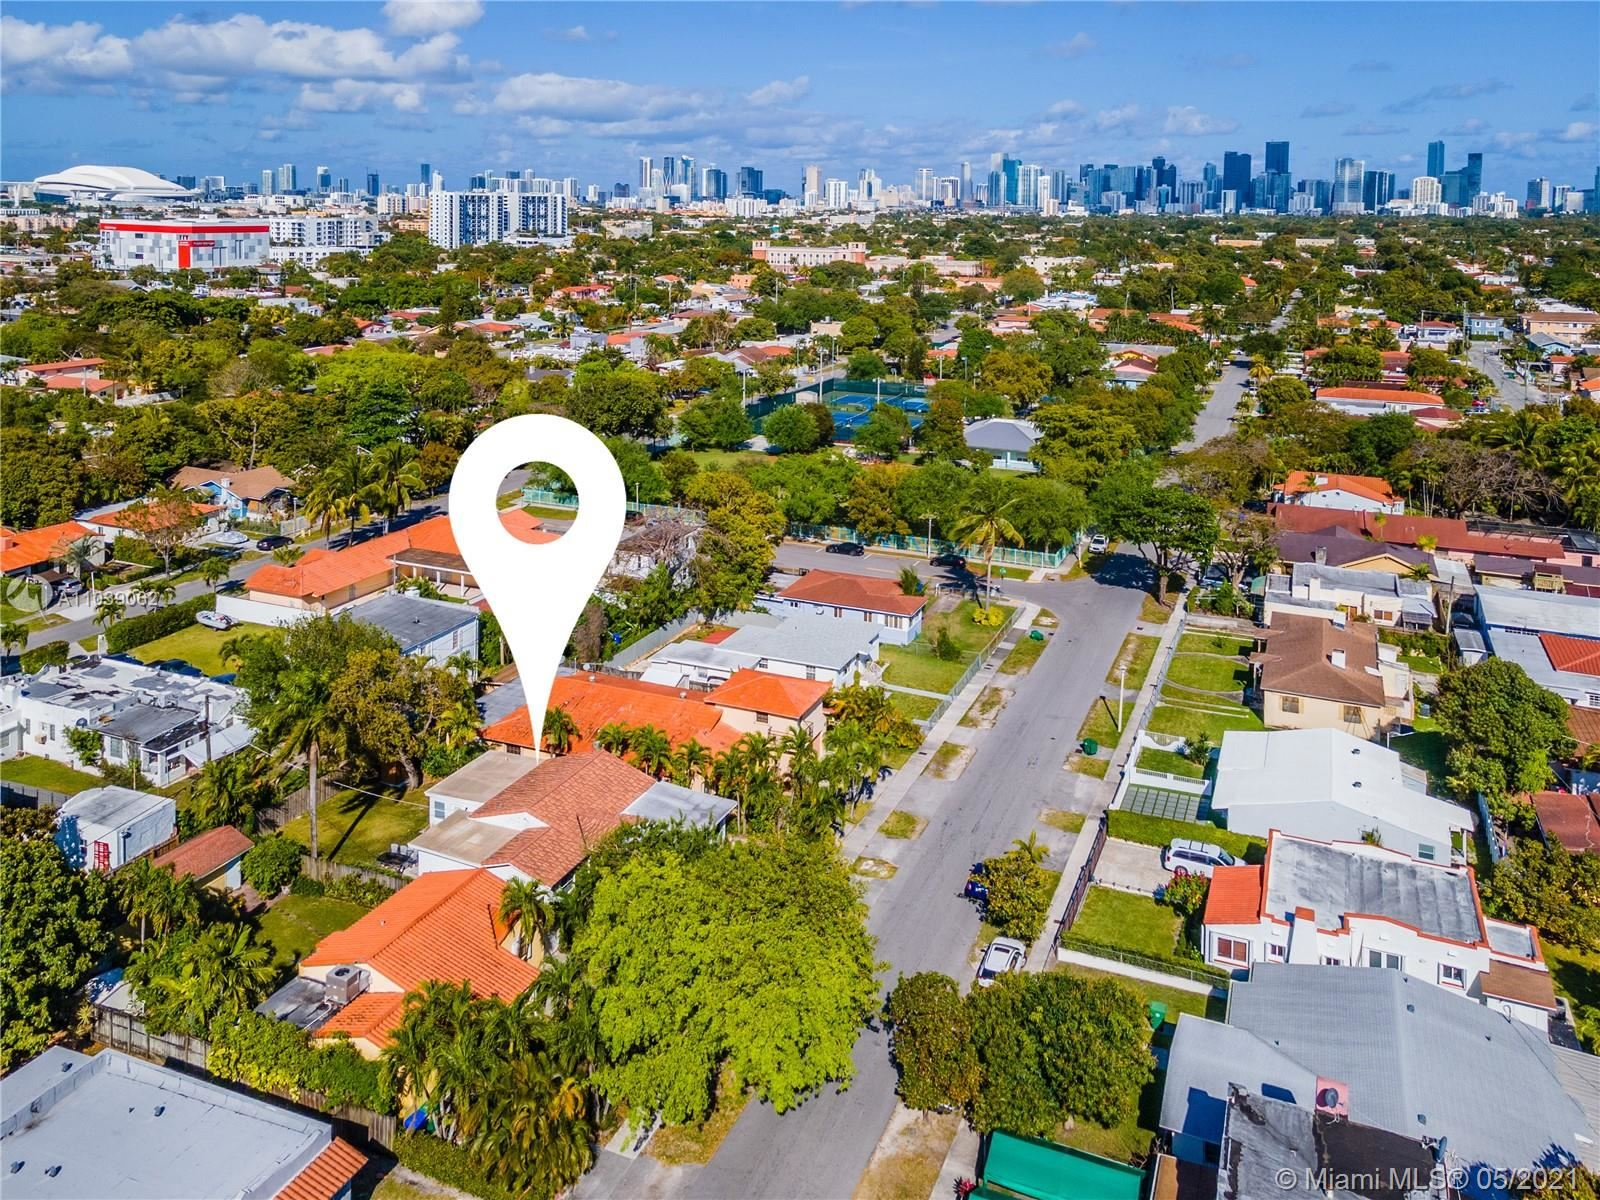 Photo of 2369 SW 13th St, Miami, FL 33145 (MLS # A11039062)